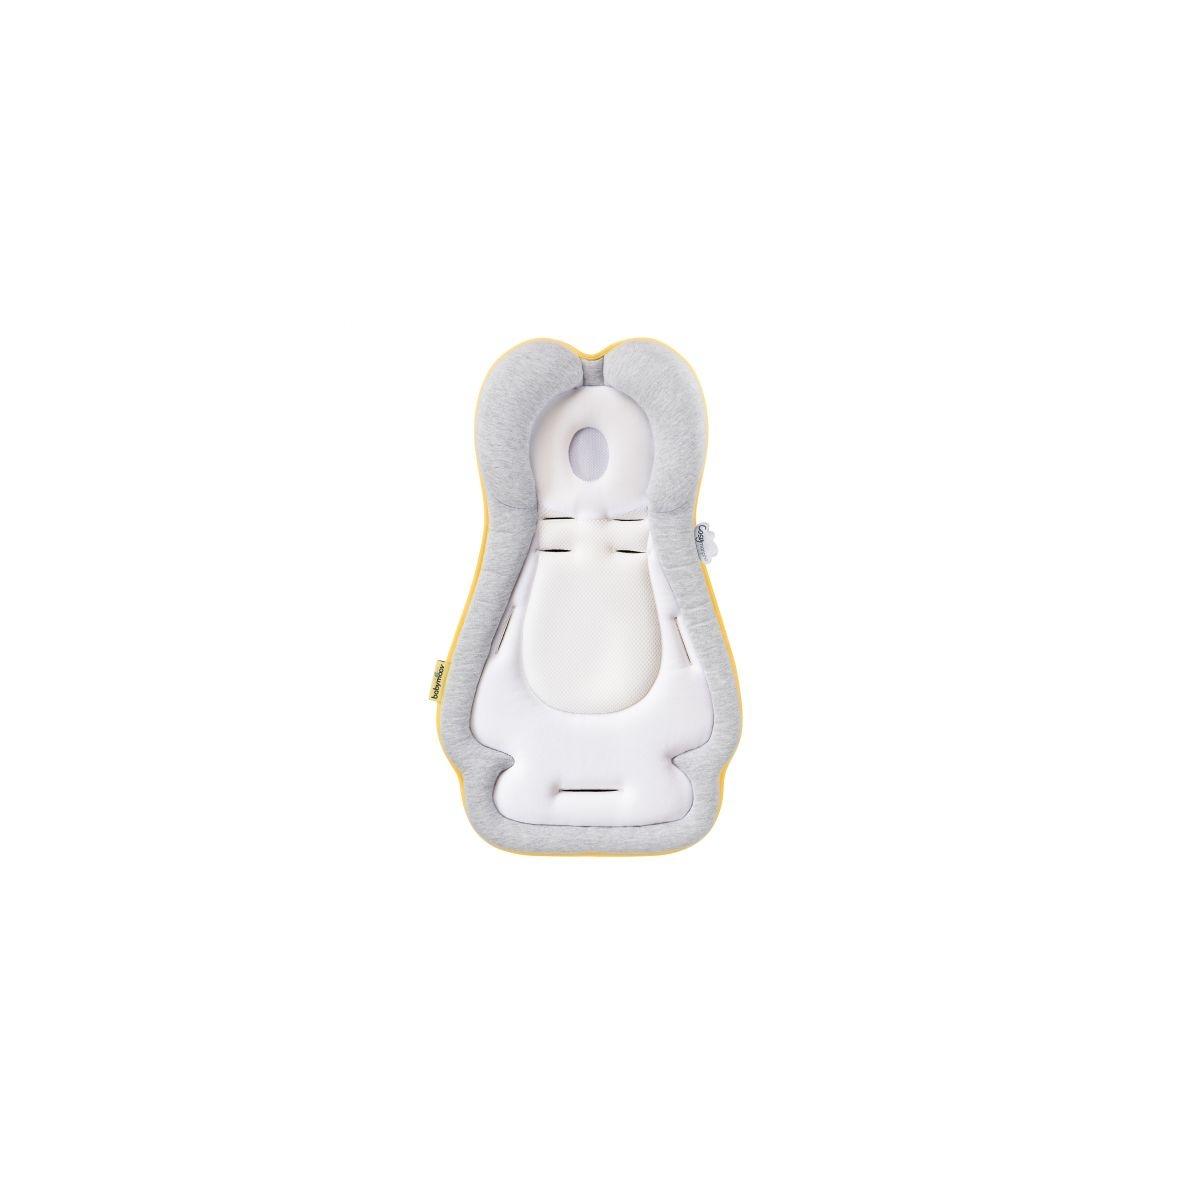 Babymoov Cosymorpho Baby Cushion